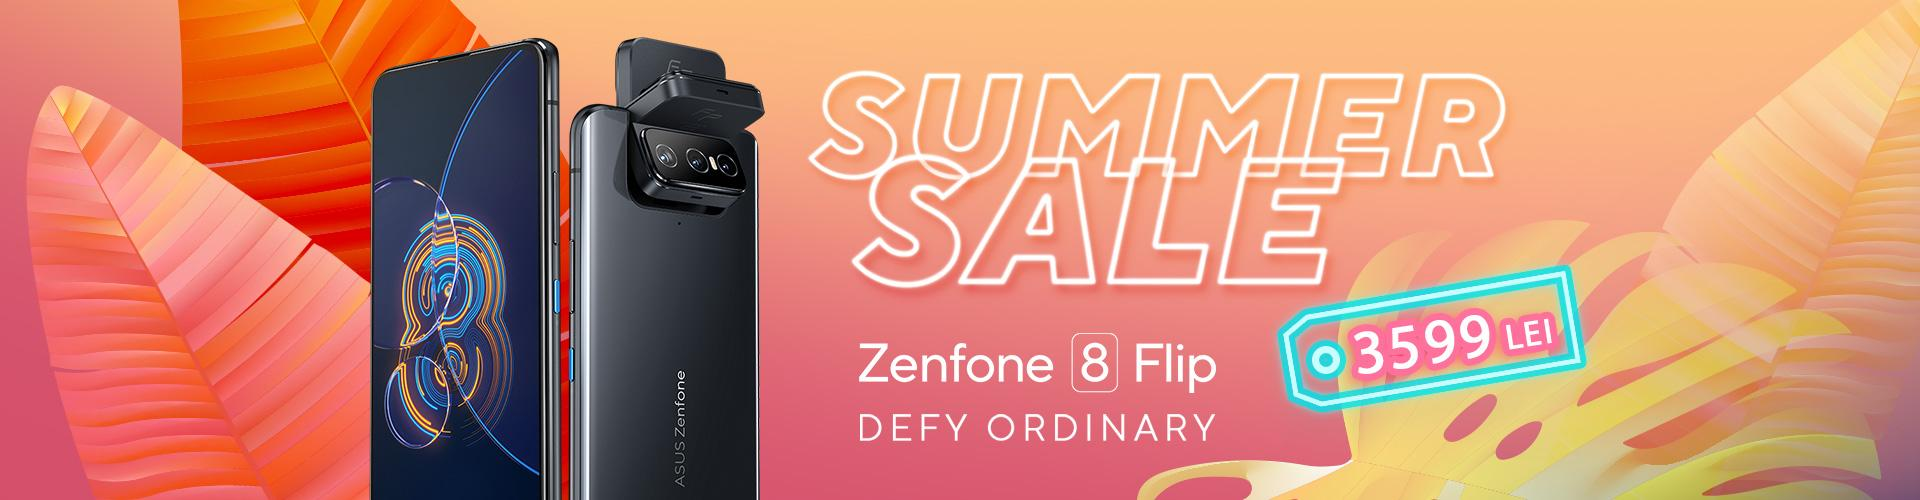 Zenfone 8 Flip Summer Sale